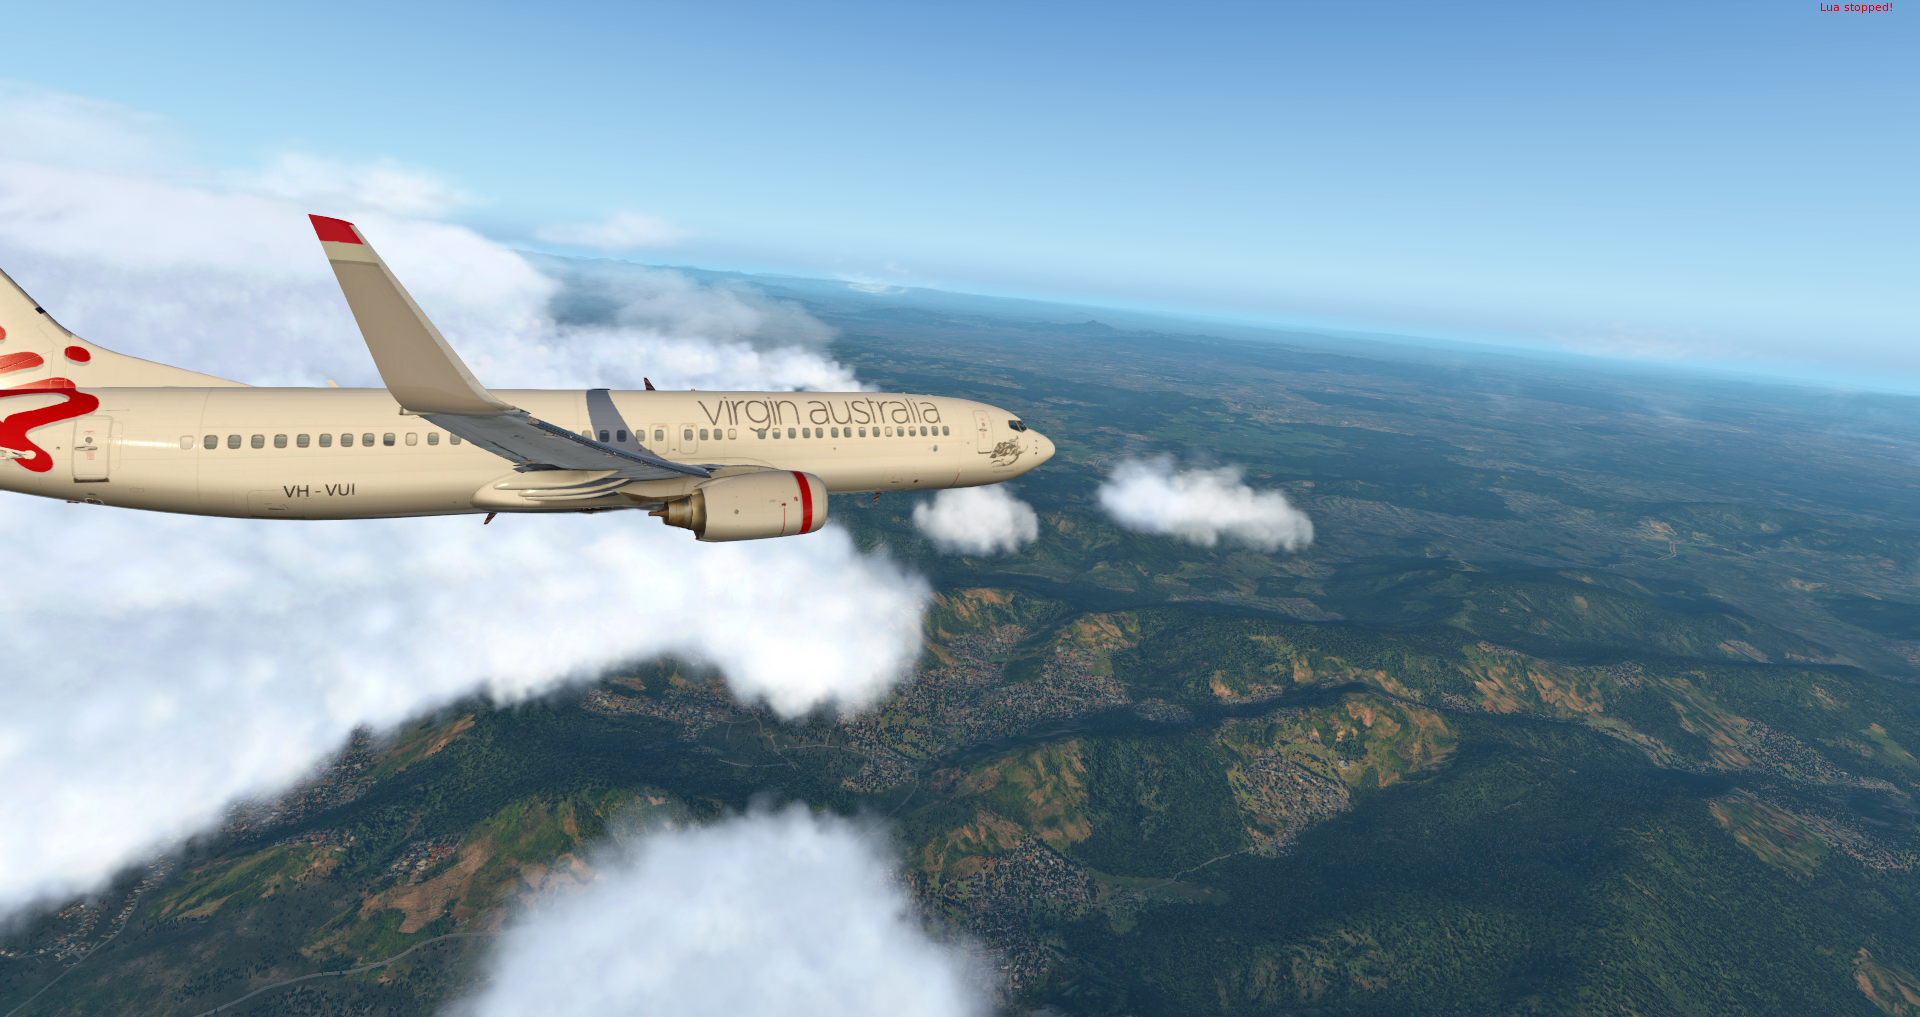 fsx p3d now x plane 11 - Greg T - Worldwide Virtual Community